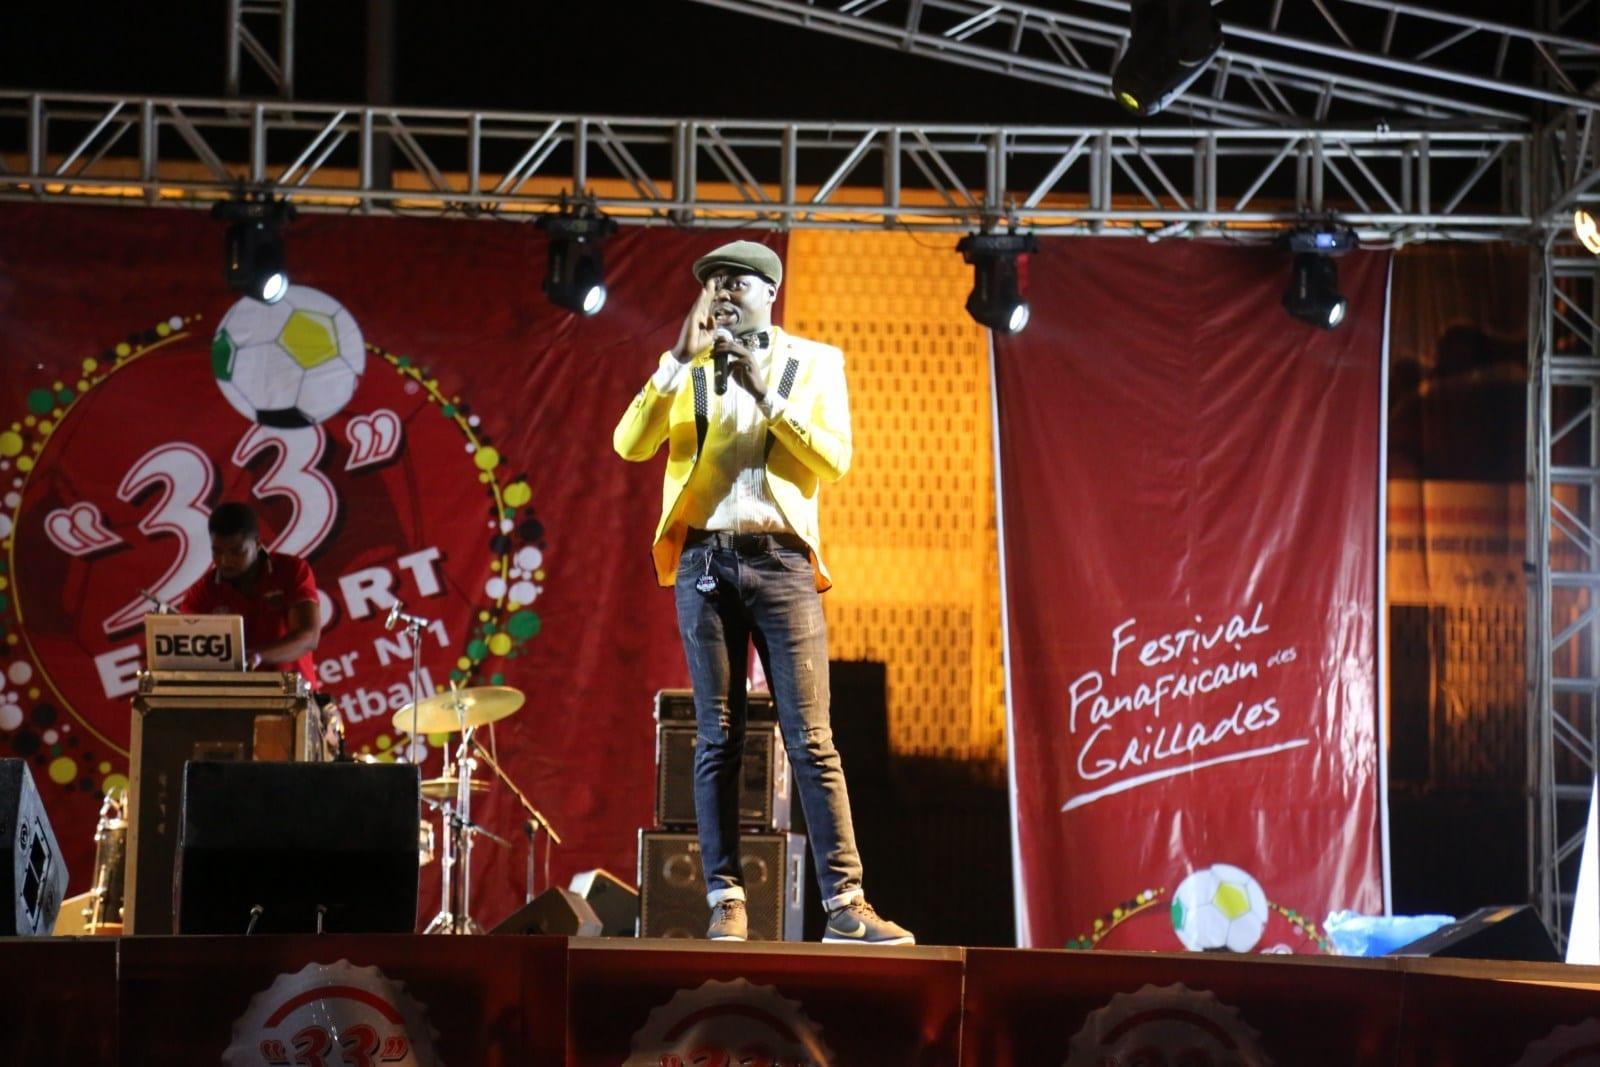 Festival Grillades_Comedien Agalawal [1600x1200]